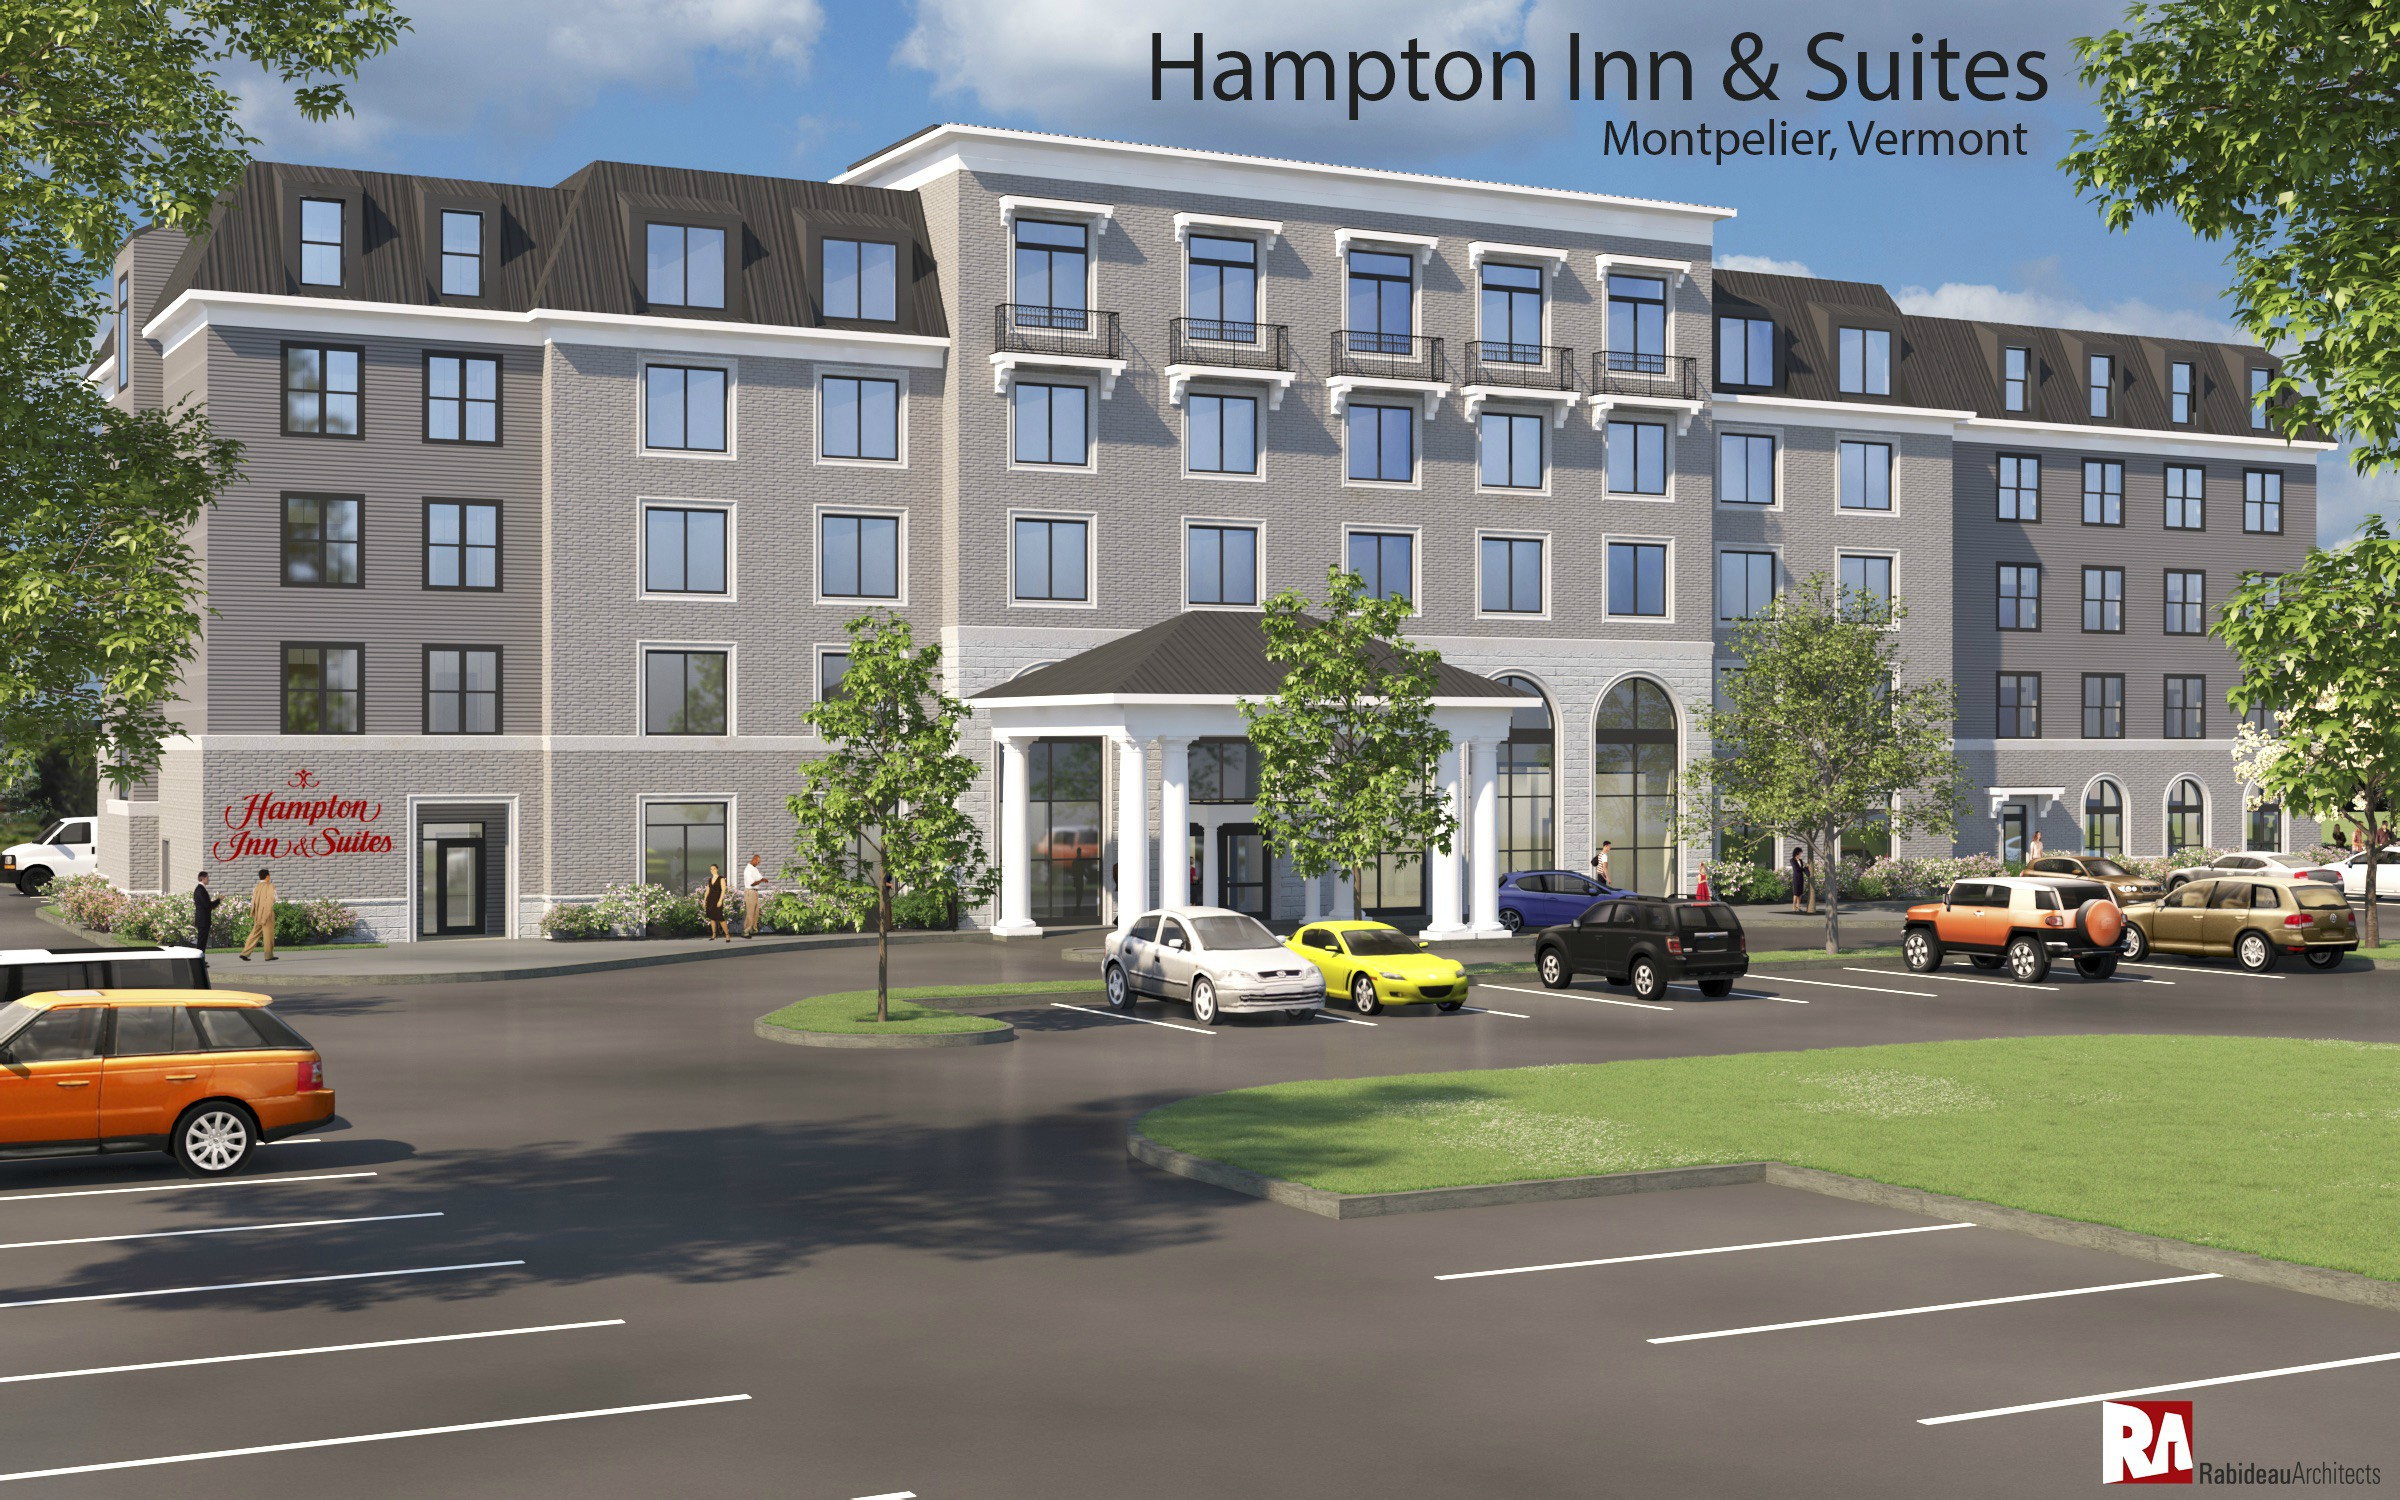 businessman plans parking garage and hotel in montpelier vtdigger rh vtdigger org hotels in montpelier virginia hotels in montpelier vermont near amtrak station